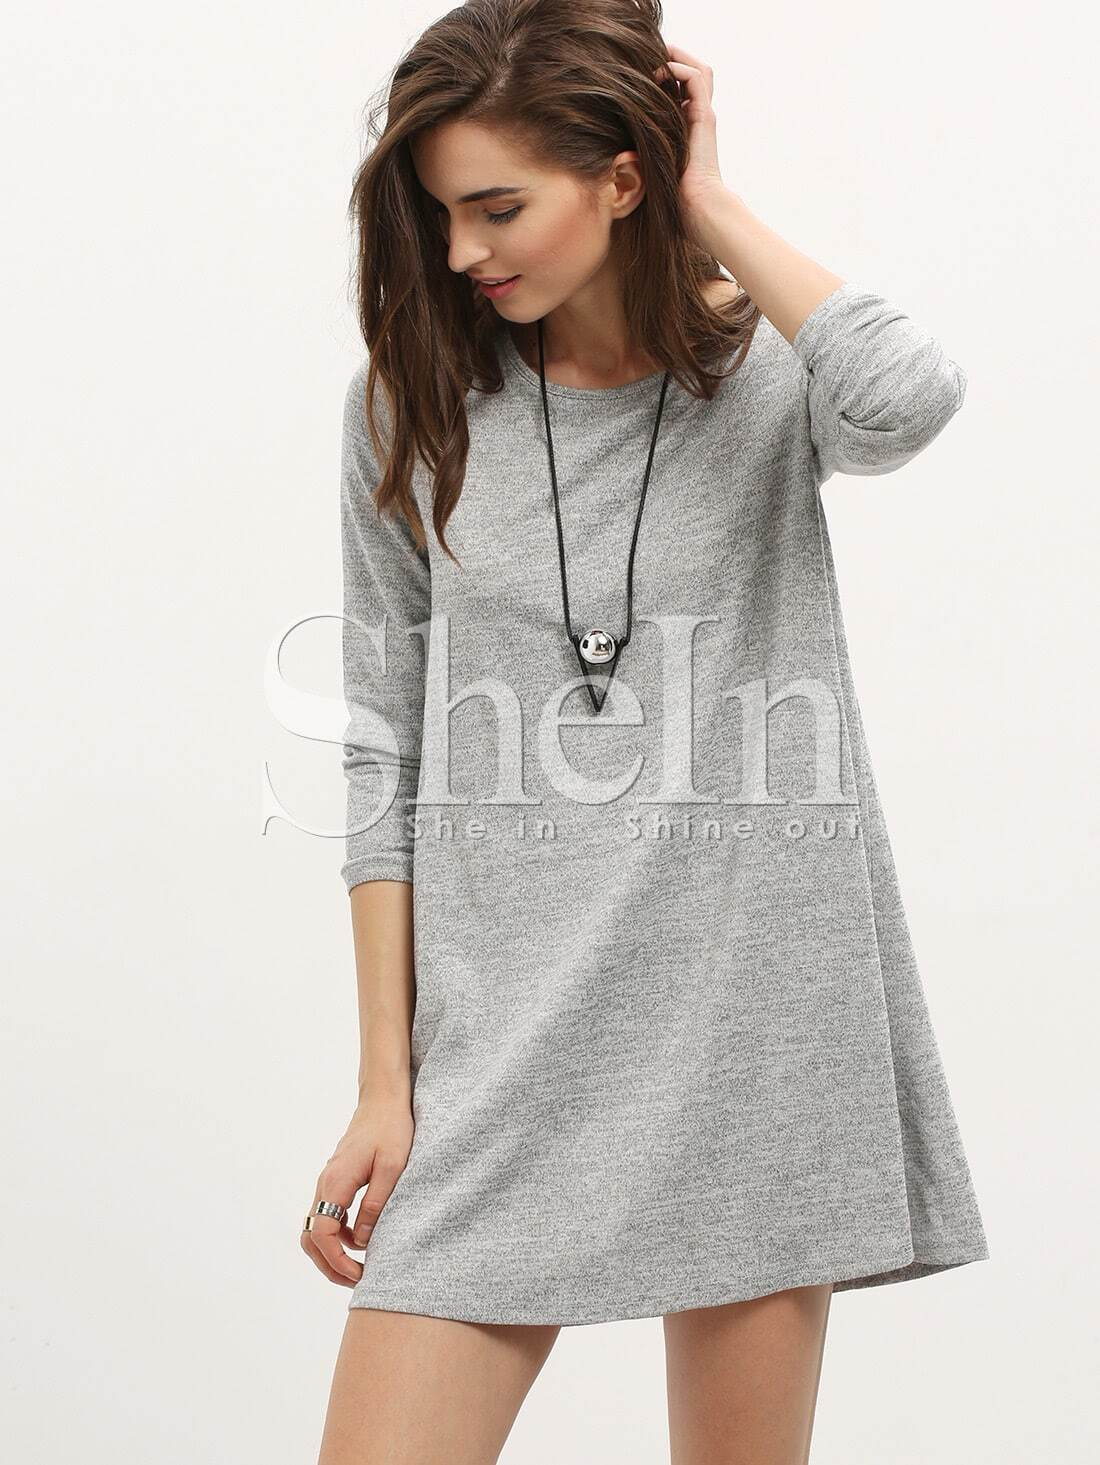 Long Sleeve Casual Dress dress151016709